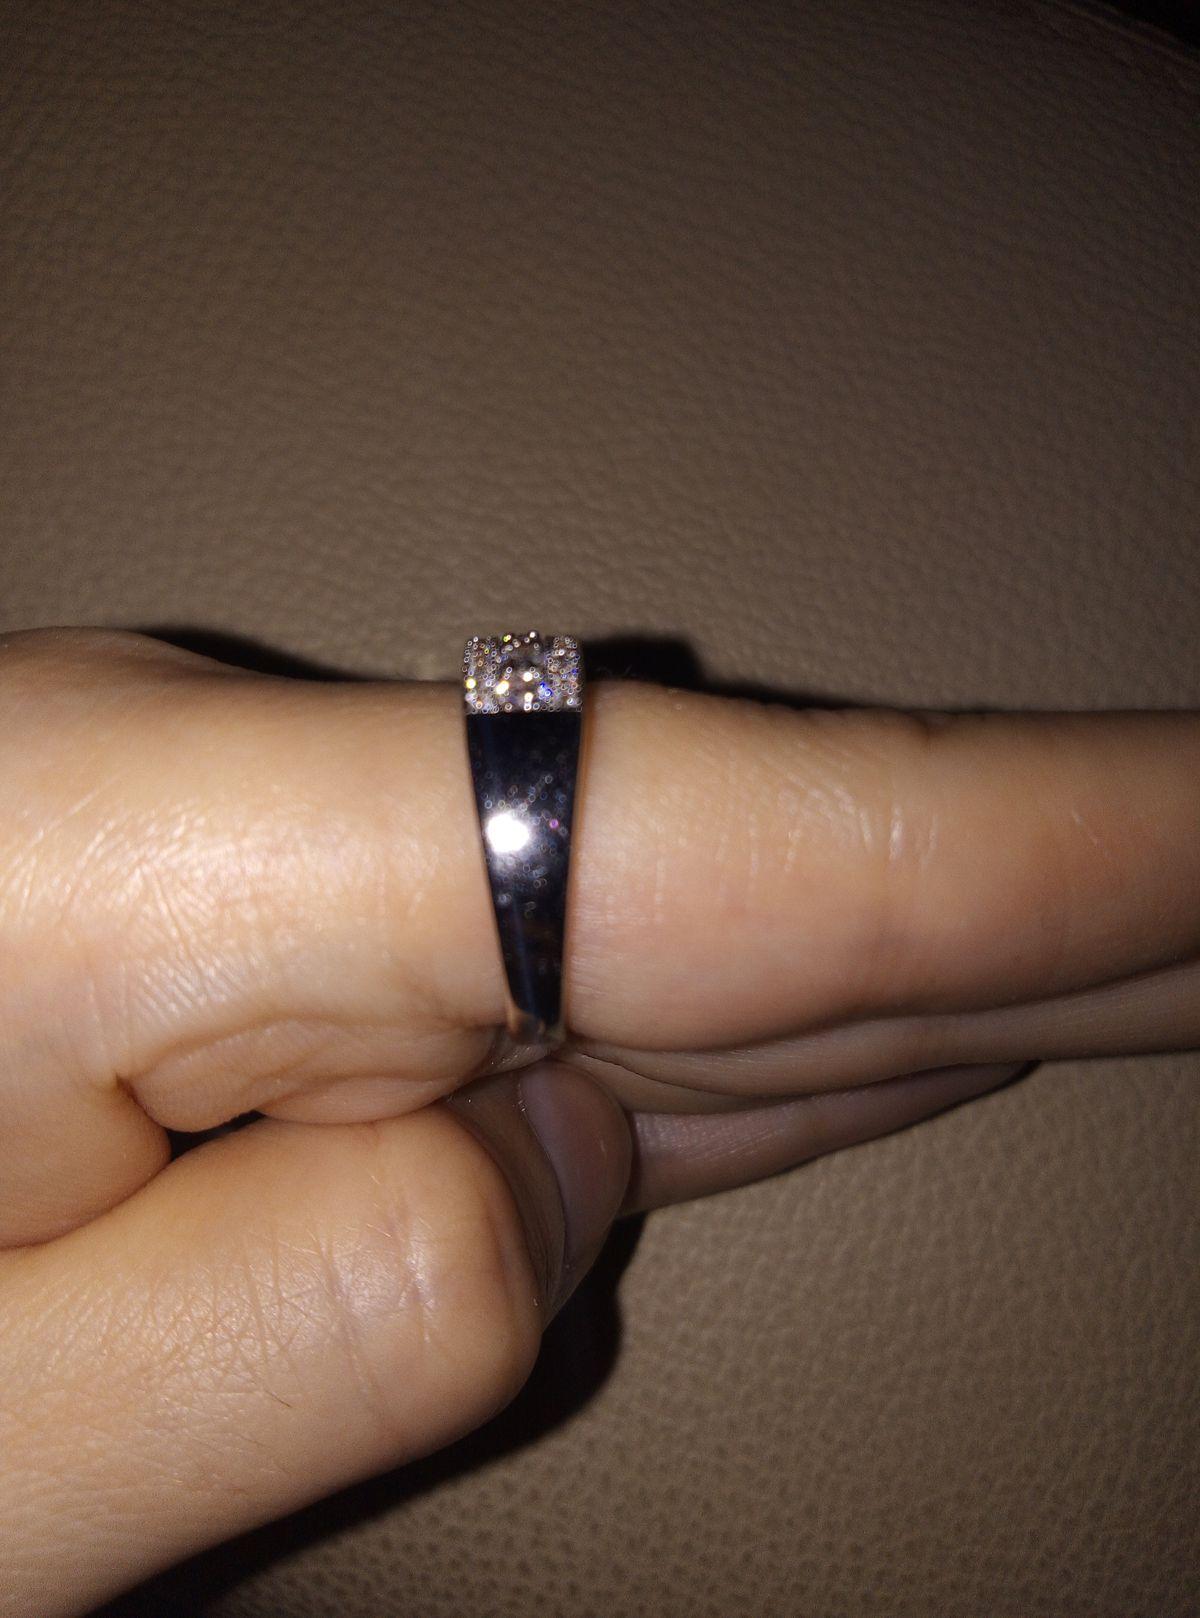 Кольцо размером 16,5